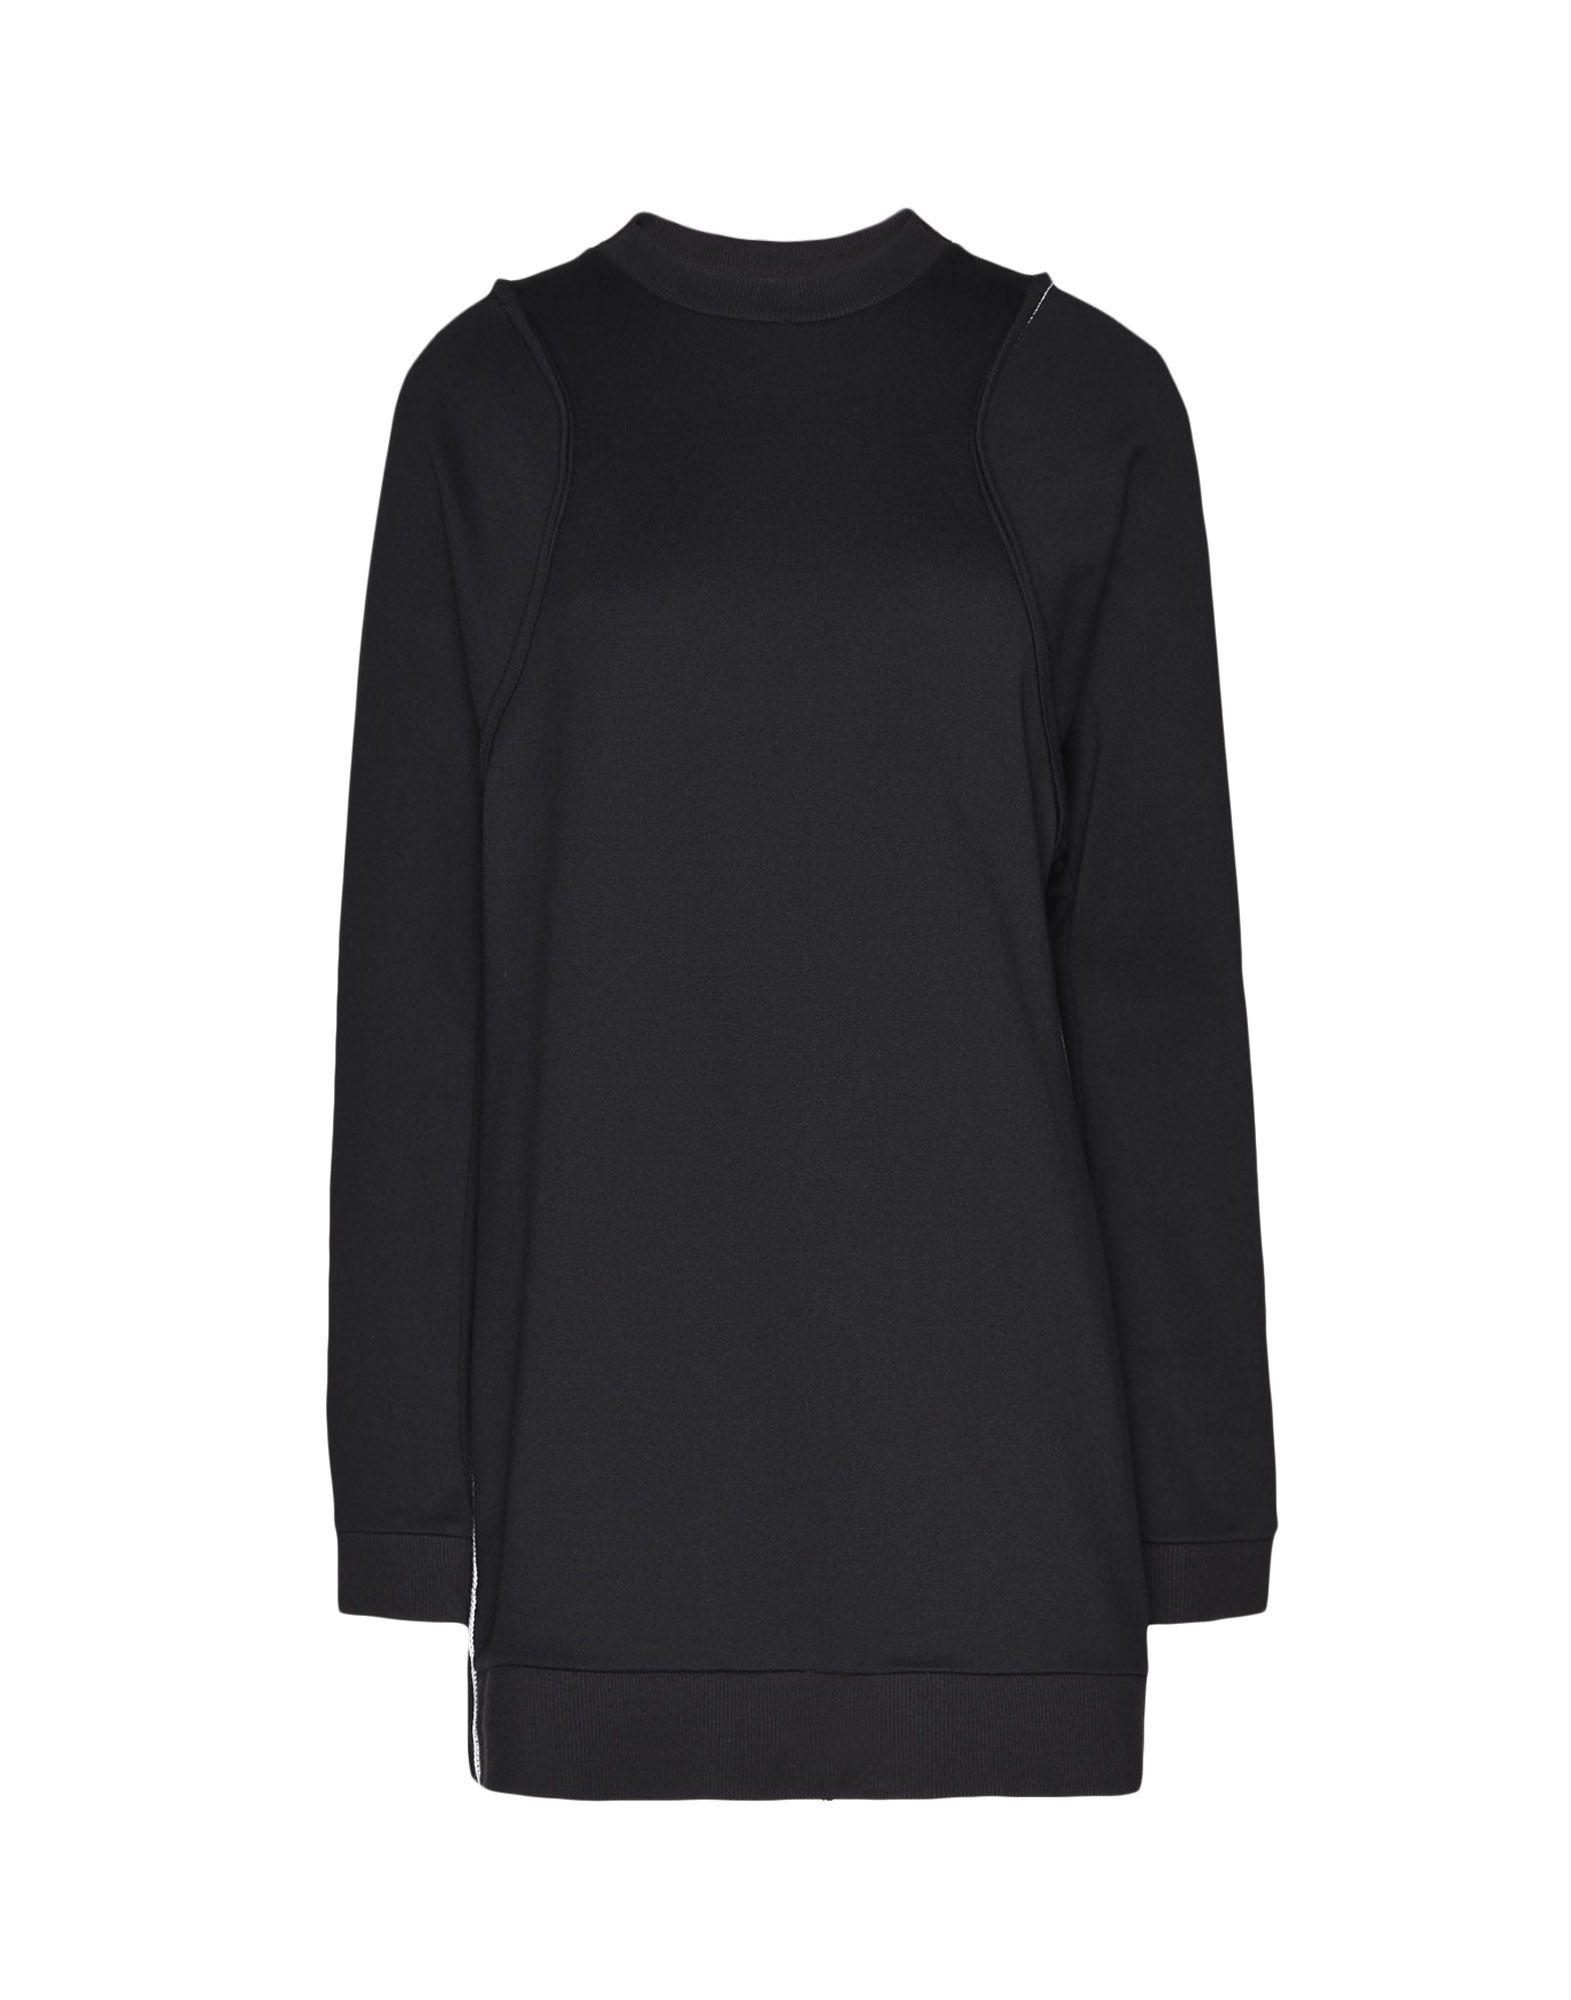 Y-3 Y-3 Sashiko Sweater Sweatshirt Woman f